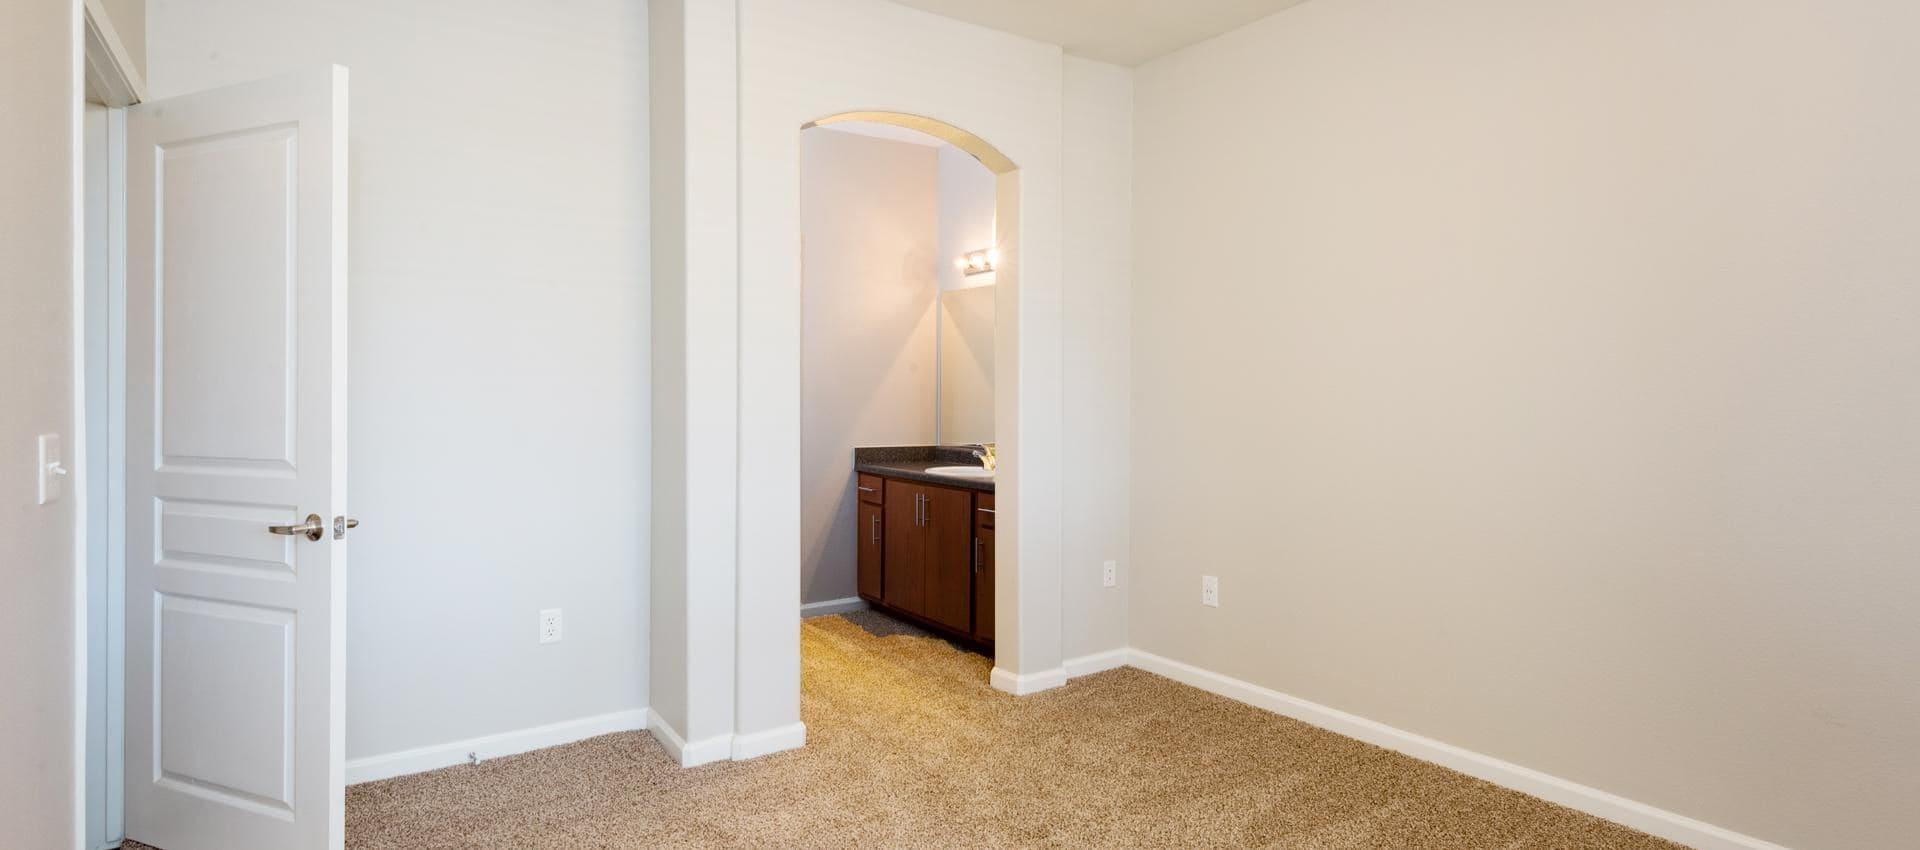 The Artisan Apartment Homes's Bedroom in Sacramento, CA